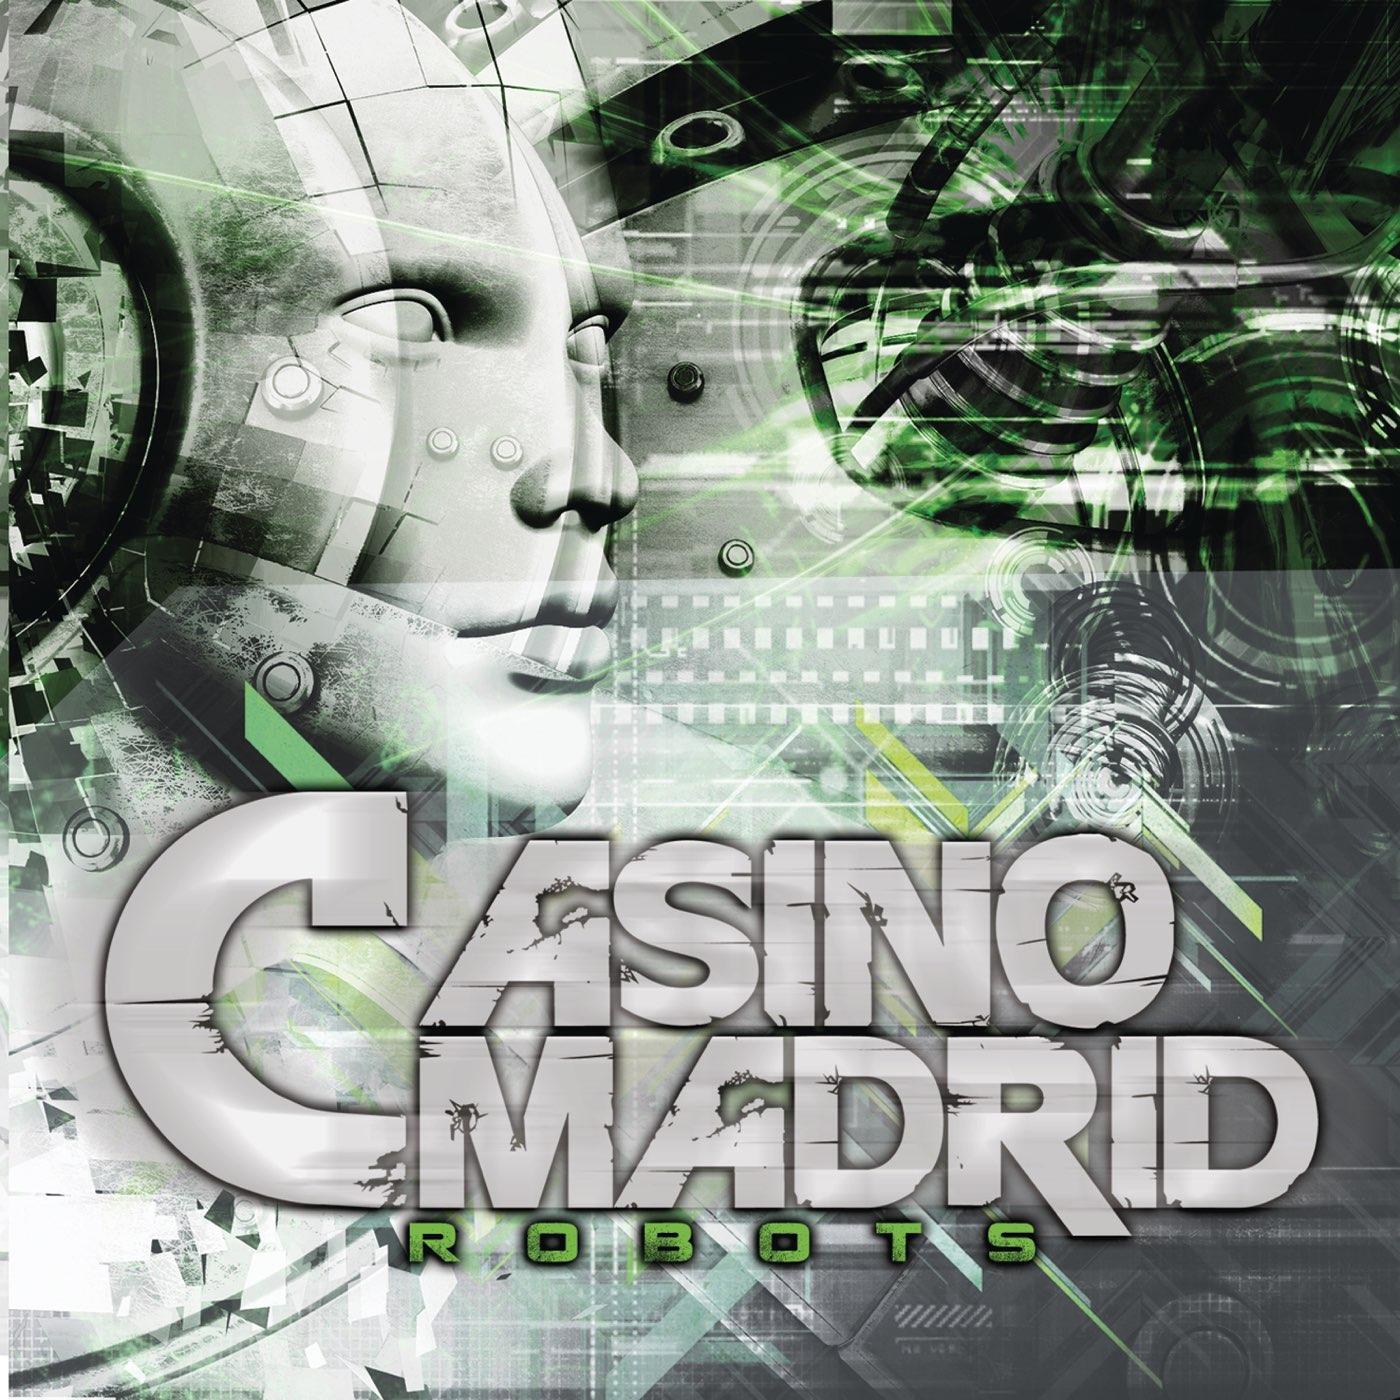 Casino Madrid - Robots (2011)